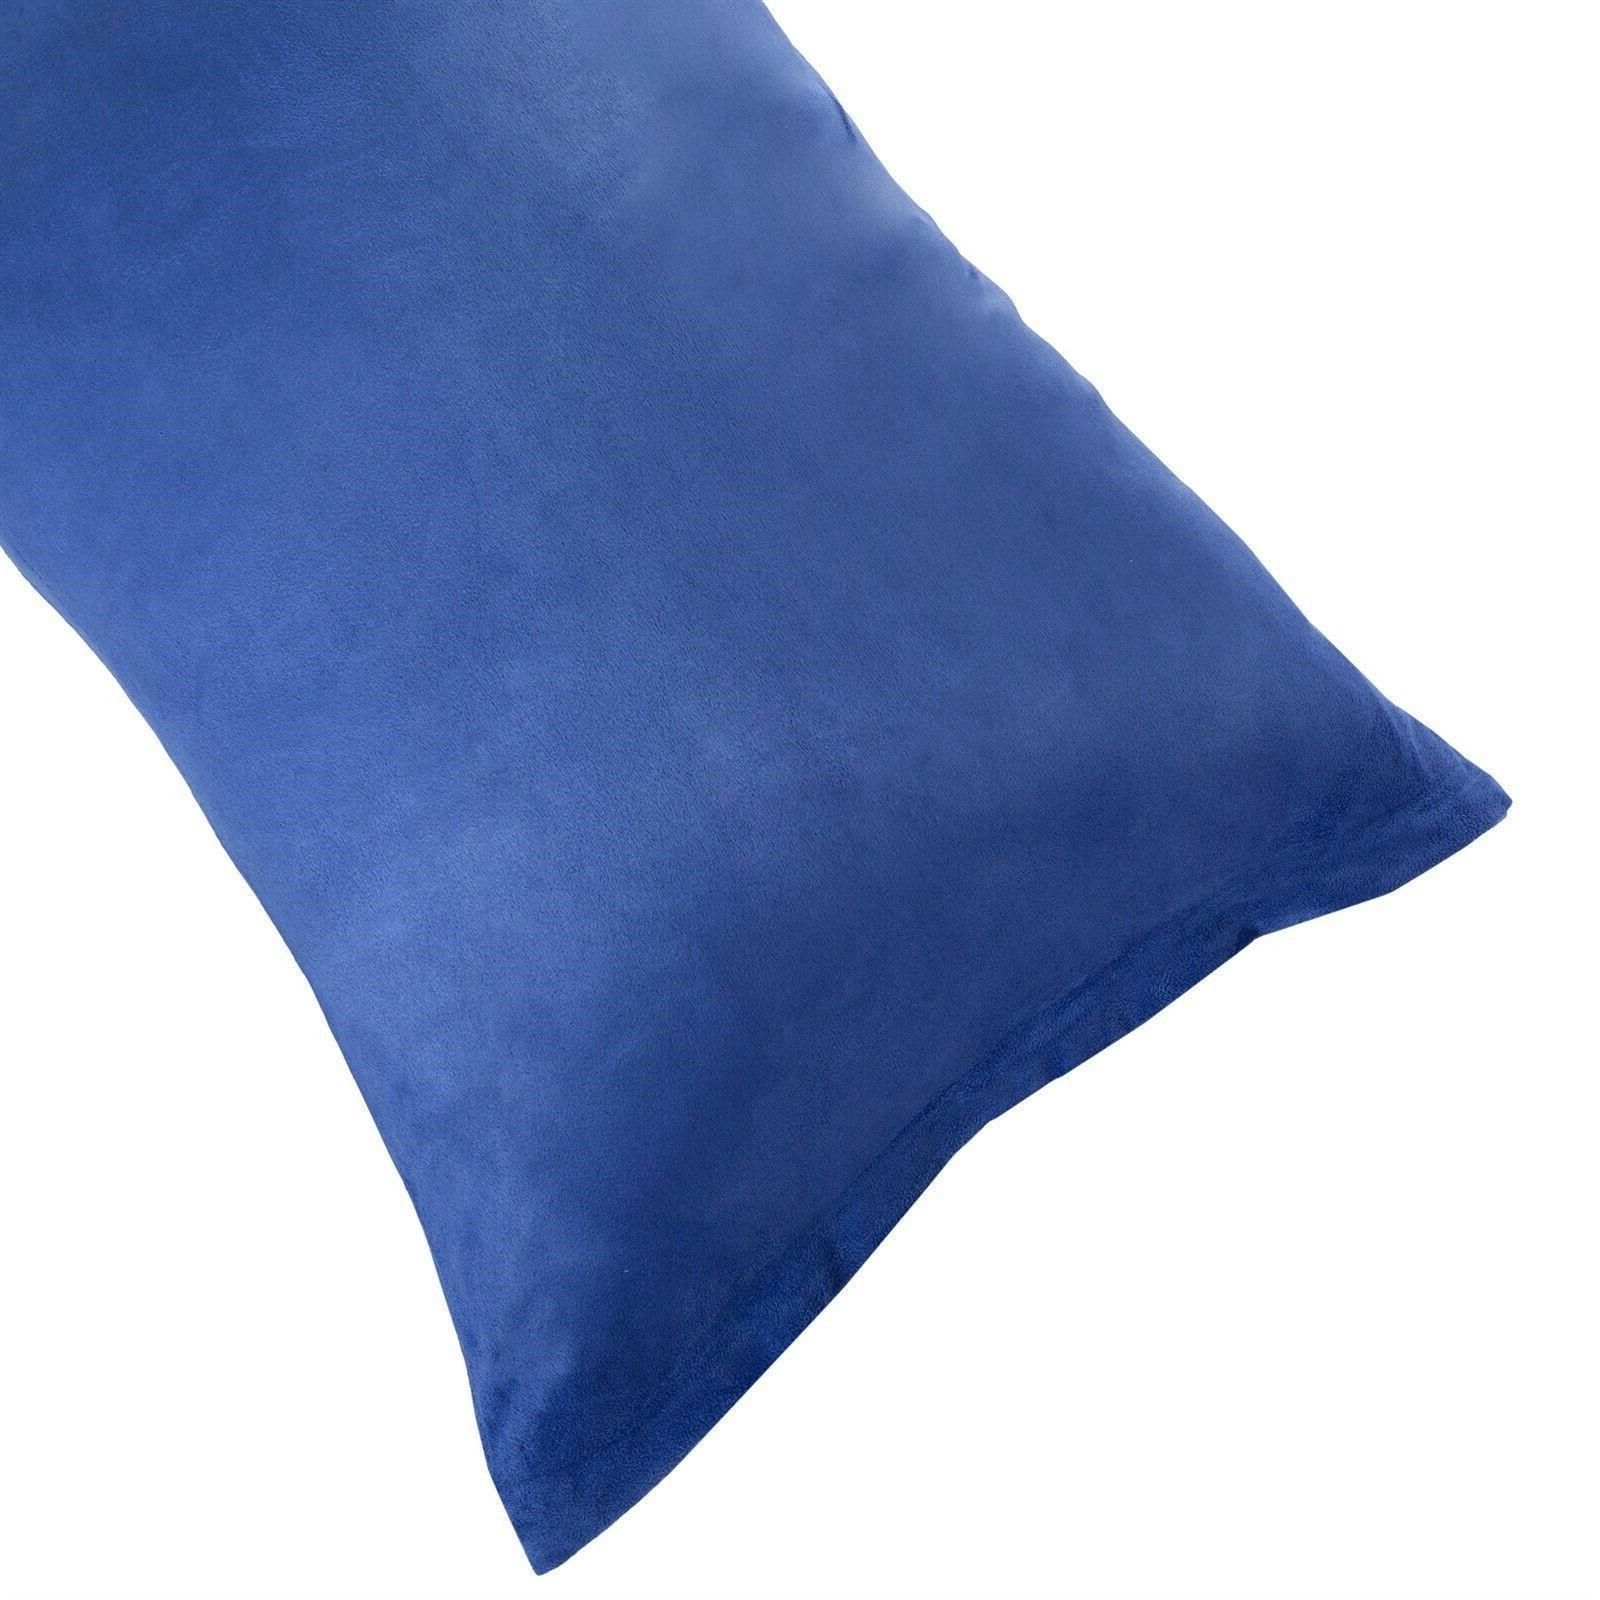 microsuede pillow cover pillowcase zippered